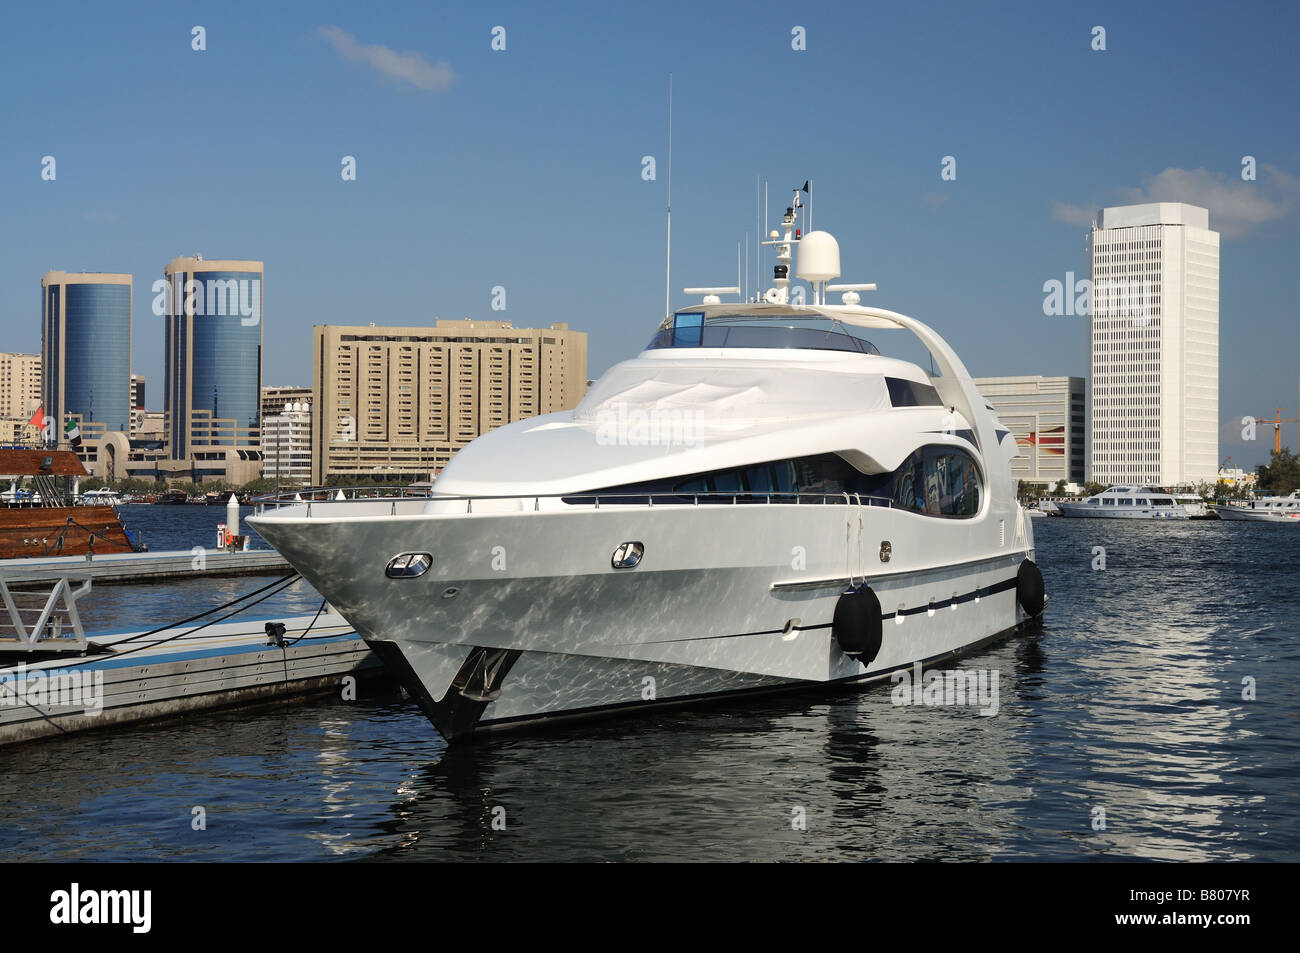 Luxury Yacht at Dubai Creek - Stock Image